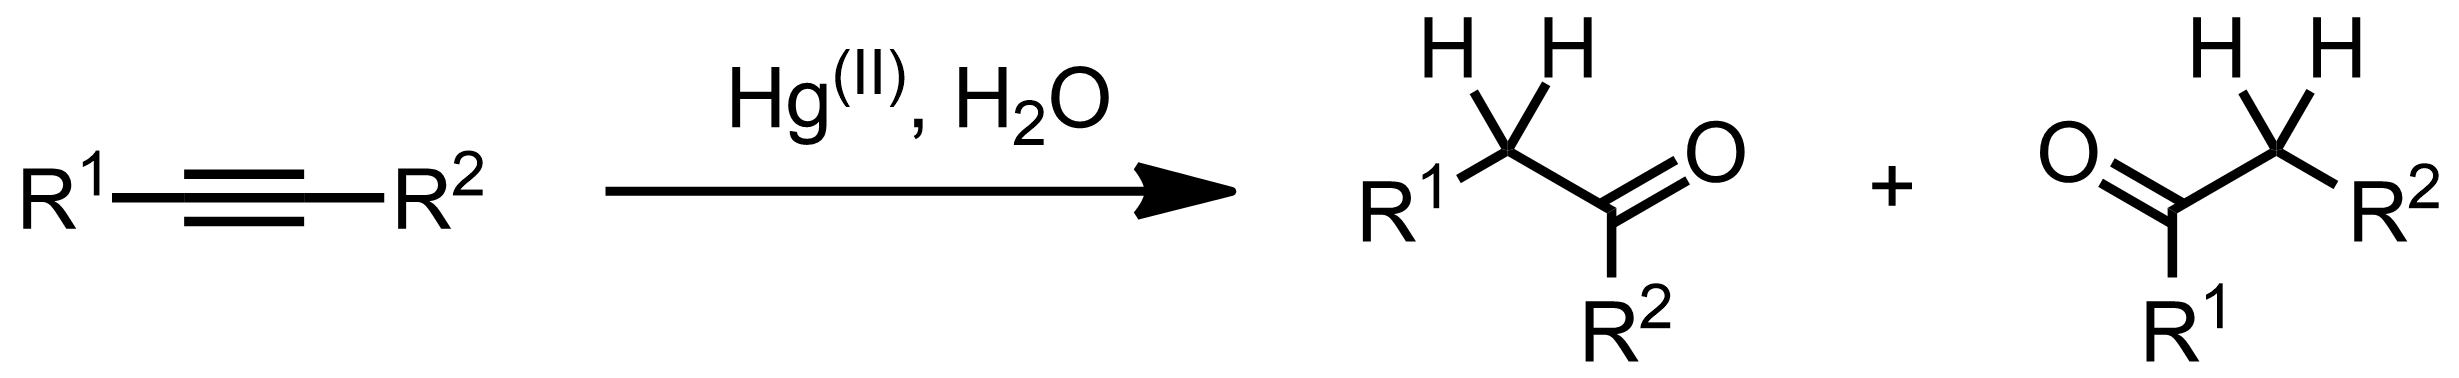 Schematic representation of the Kucherov Reaction.